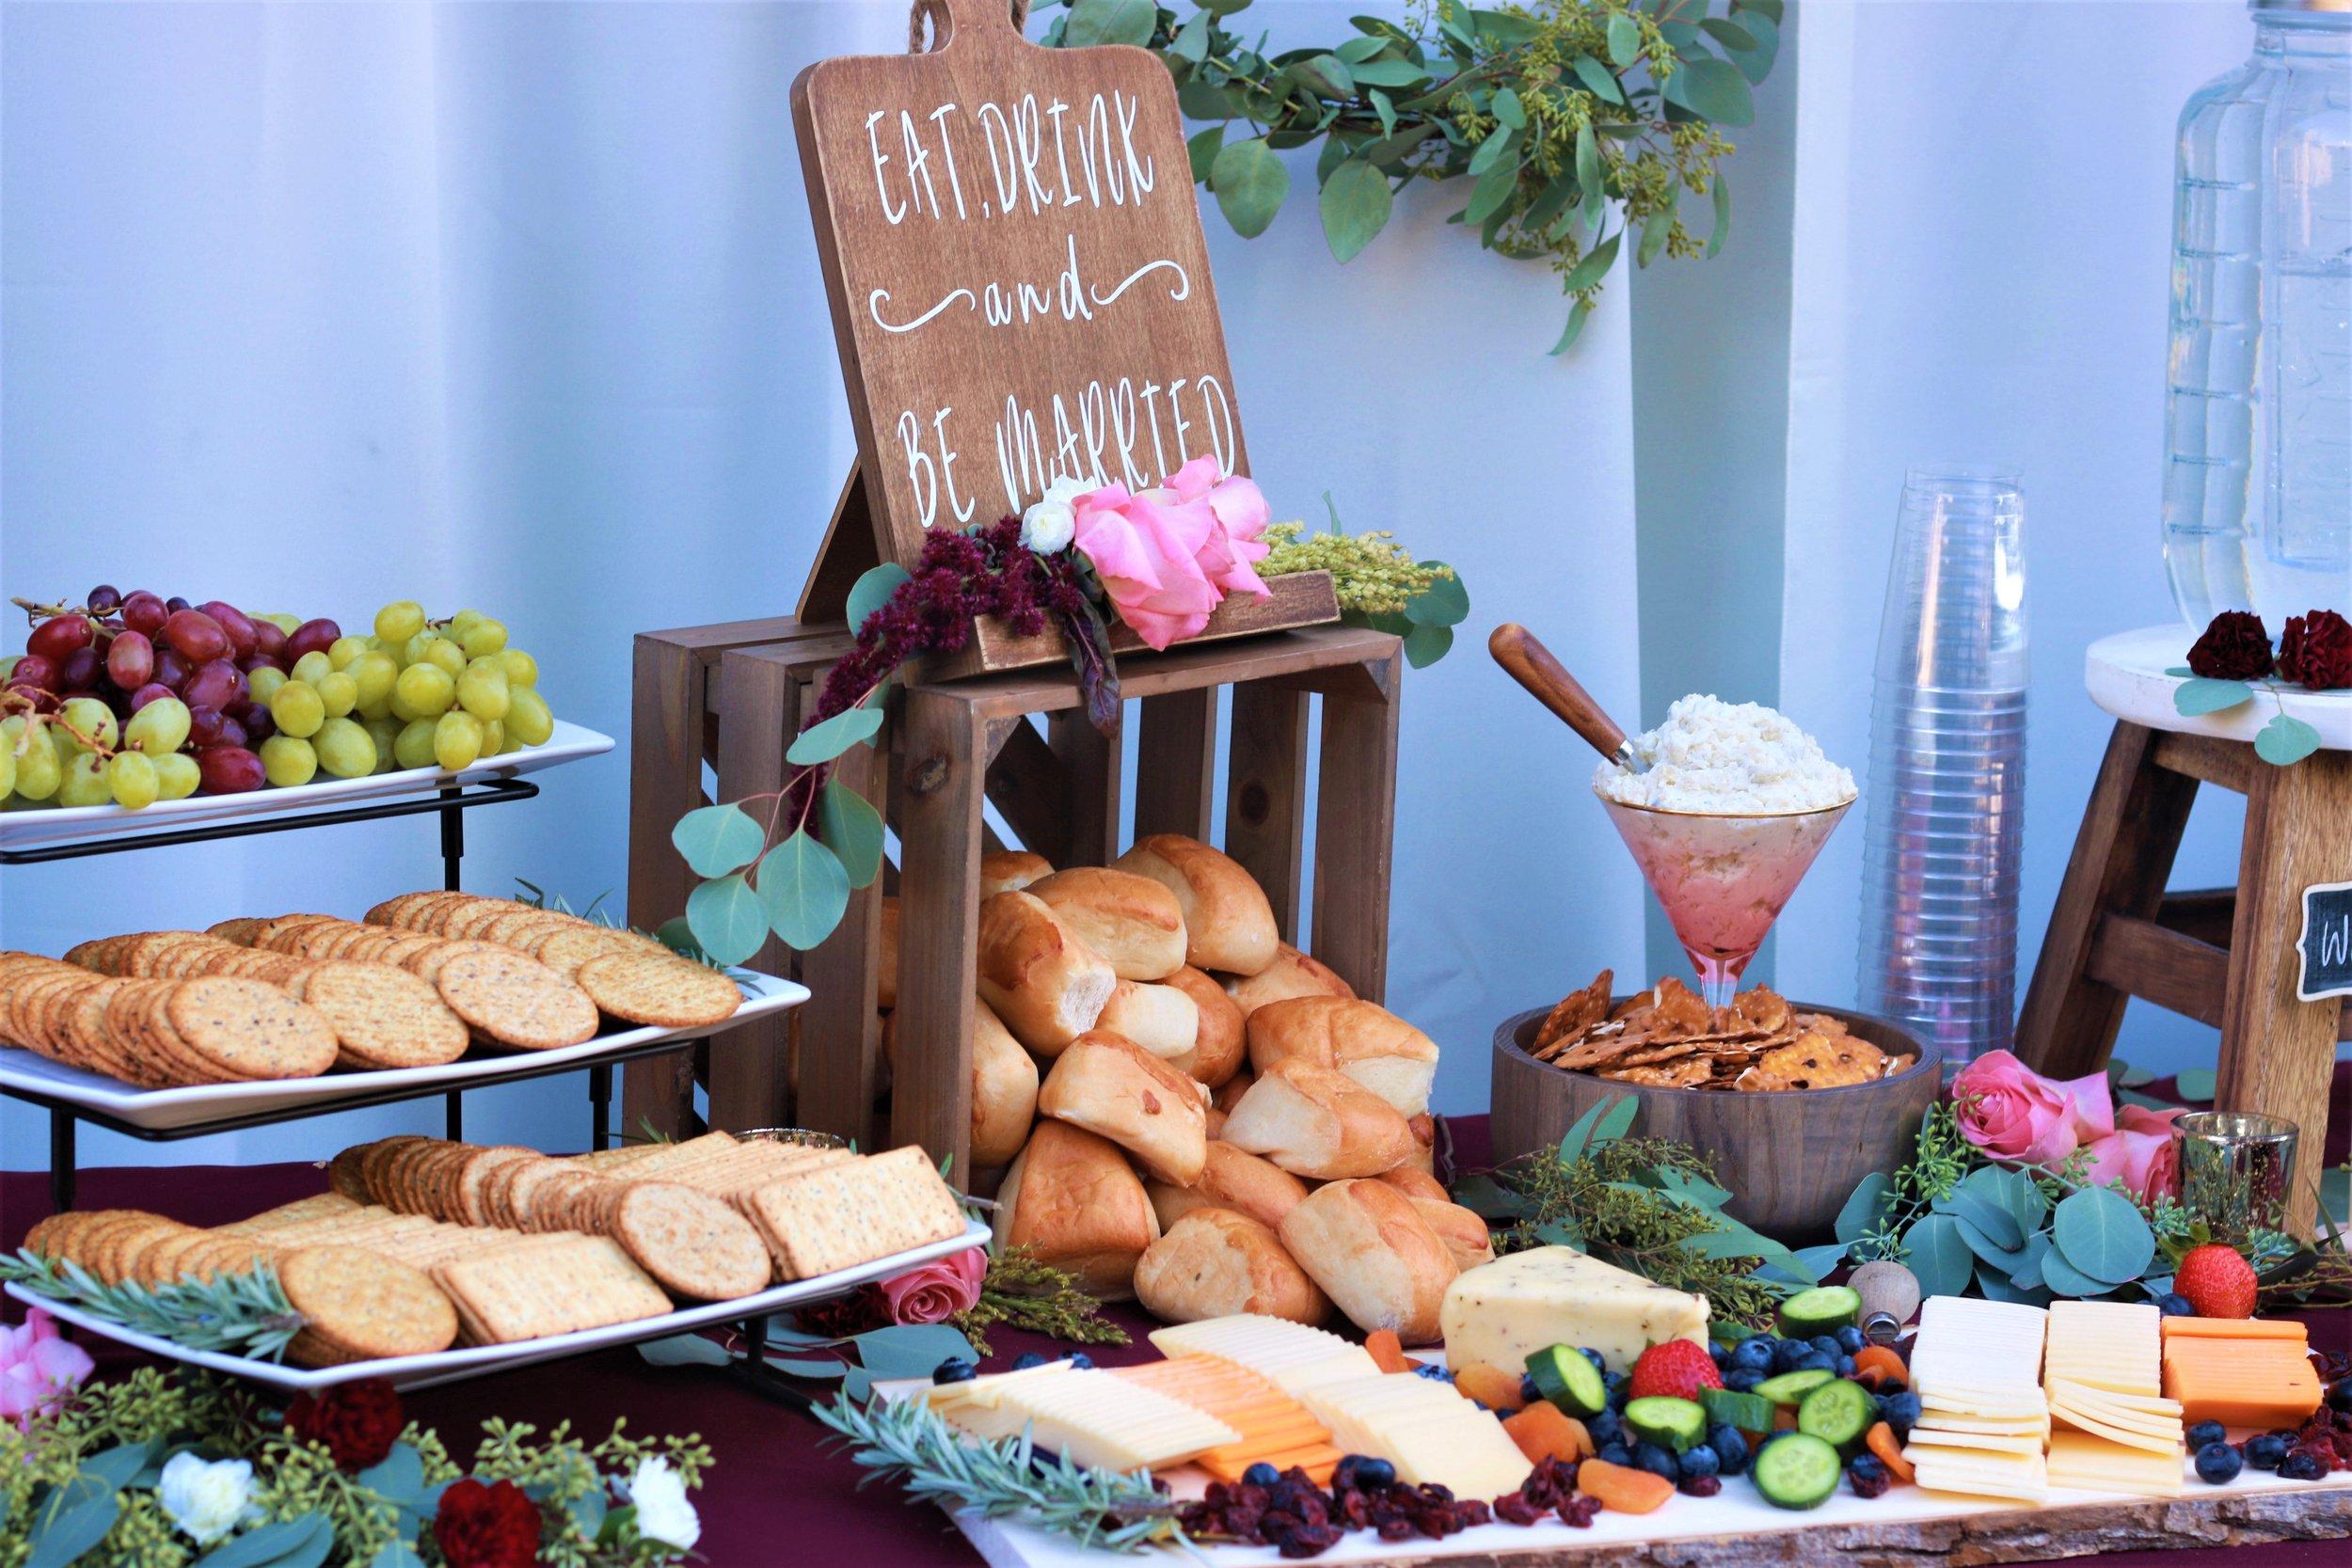 Fall Wedding Food-wedding appetizers-wedding-Eat and Drink and Be Married-wedding food table-burgundy wedding-wedding ideas-www.SugarPartiesLA.com